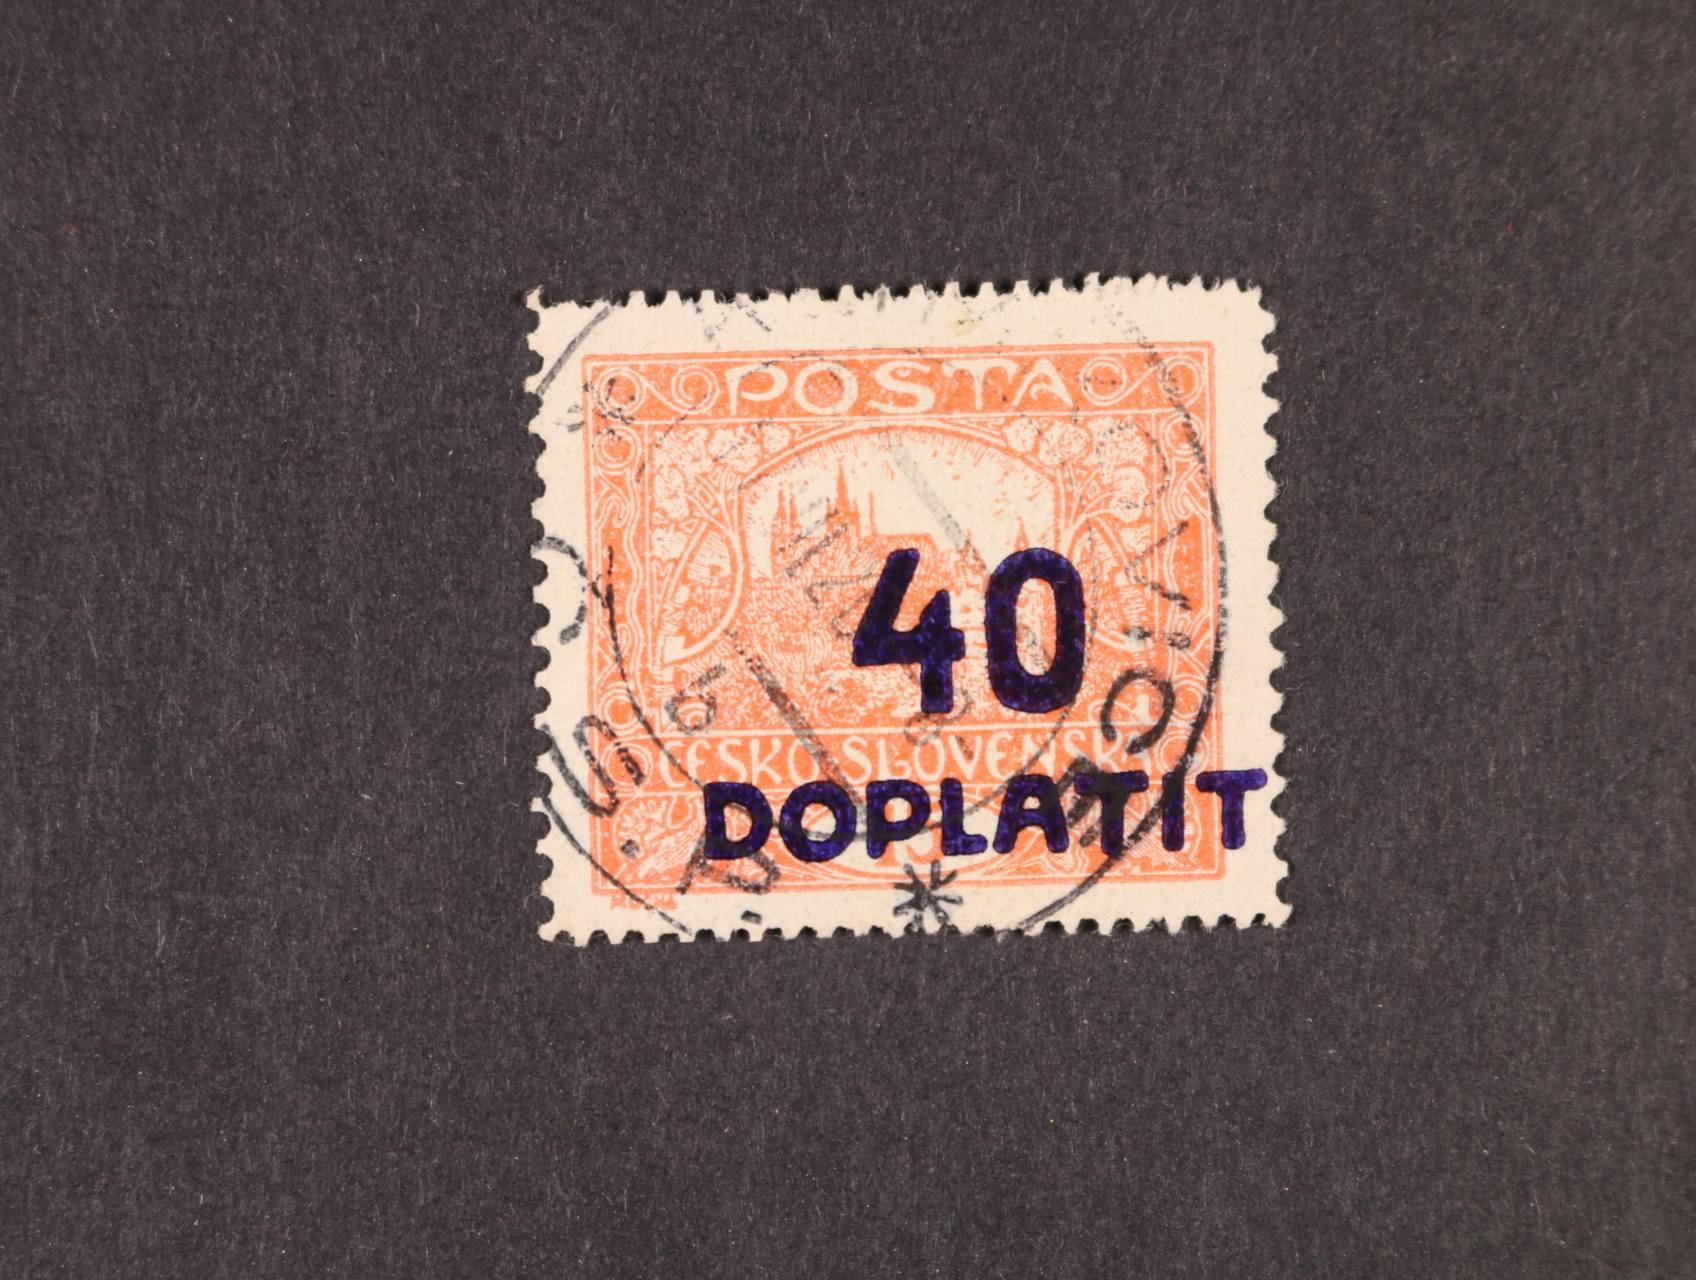 zn. DL č. 30 D, typ II, zk. Gilbert, atest Štolfa, kat. cena 8000 Kč